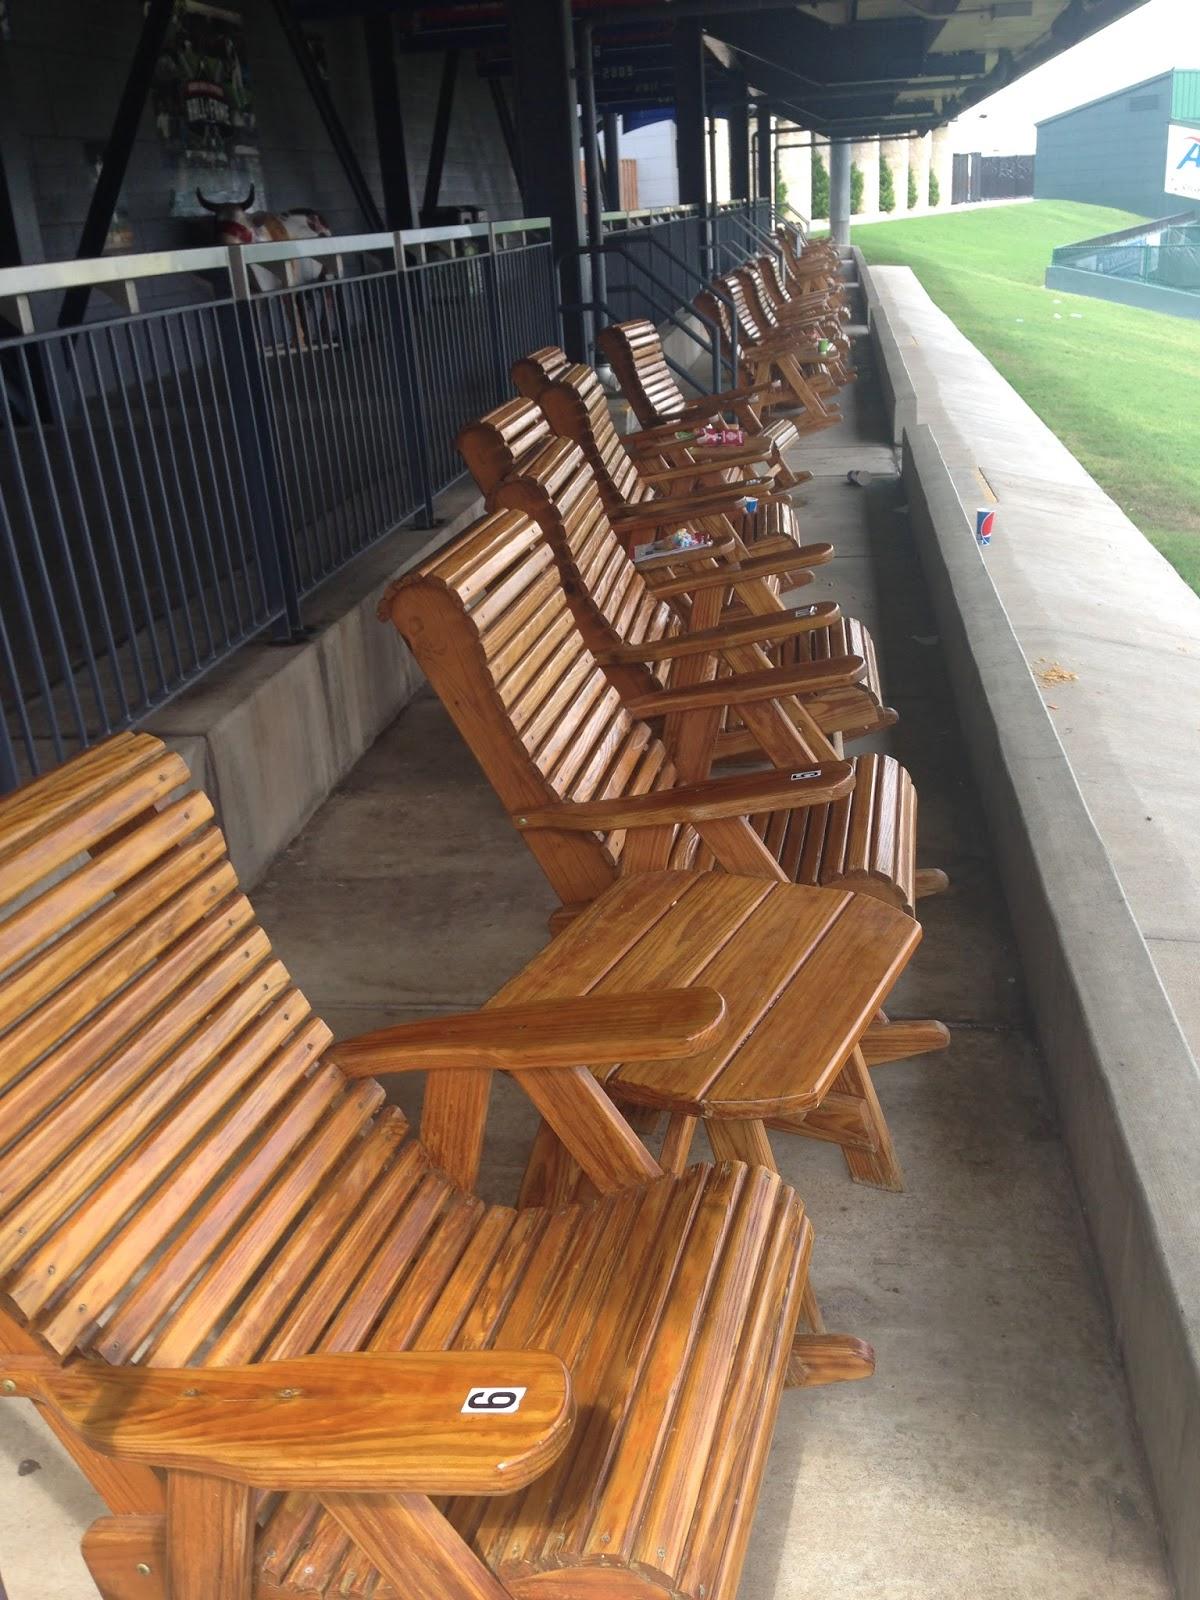 Swell Radio Nut Josh Pcl Travel Dell Diamond Round Rock Texas Creativecarmelina Interior Chair Design Creativecarmelinacom